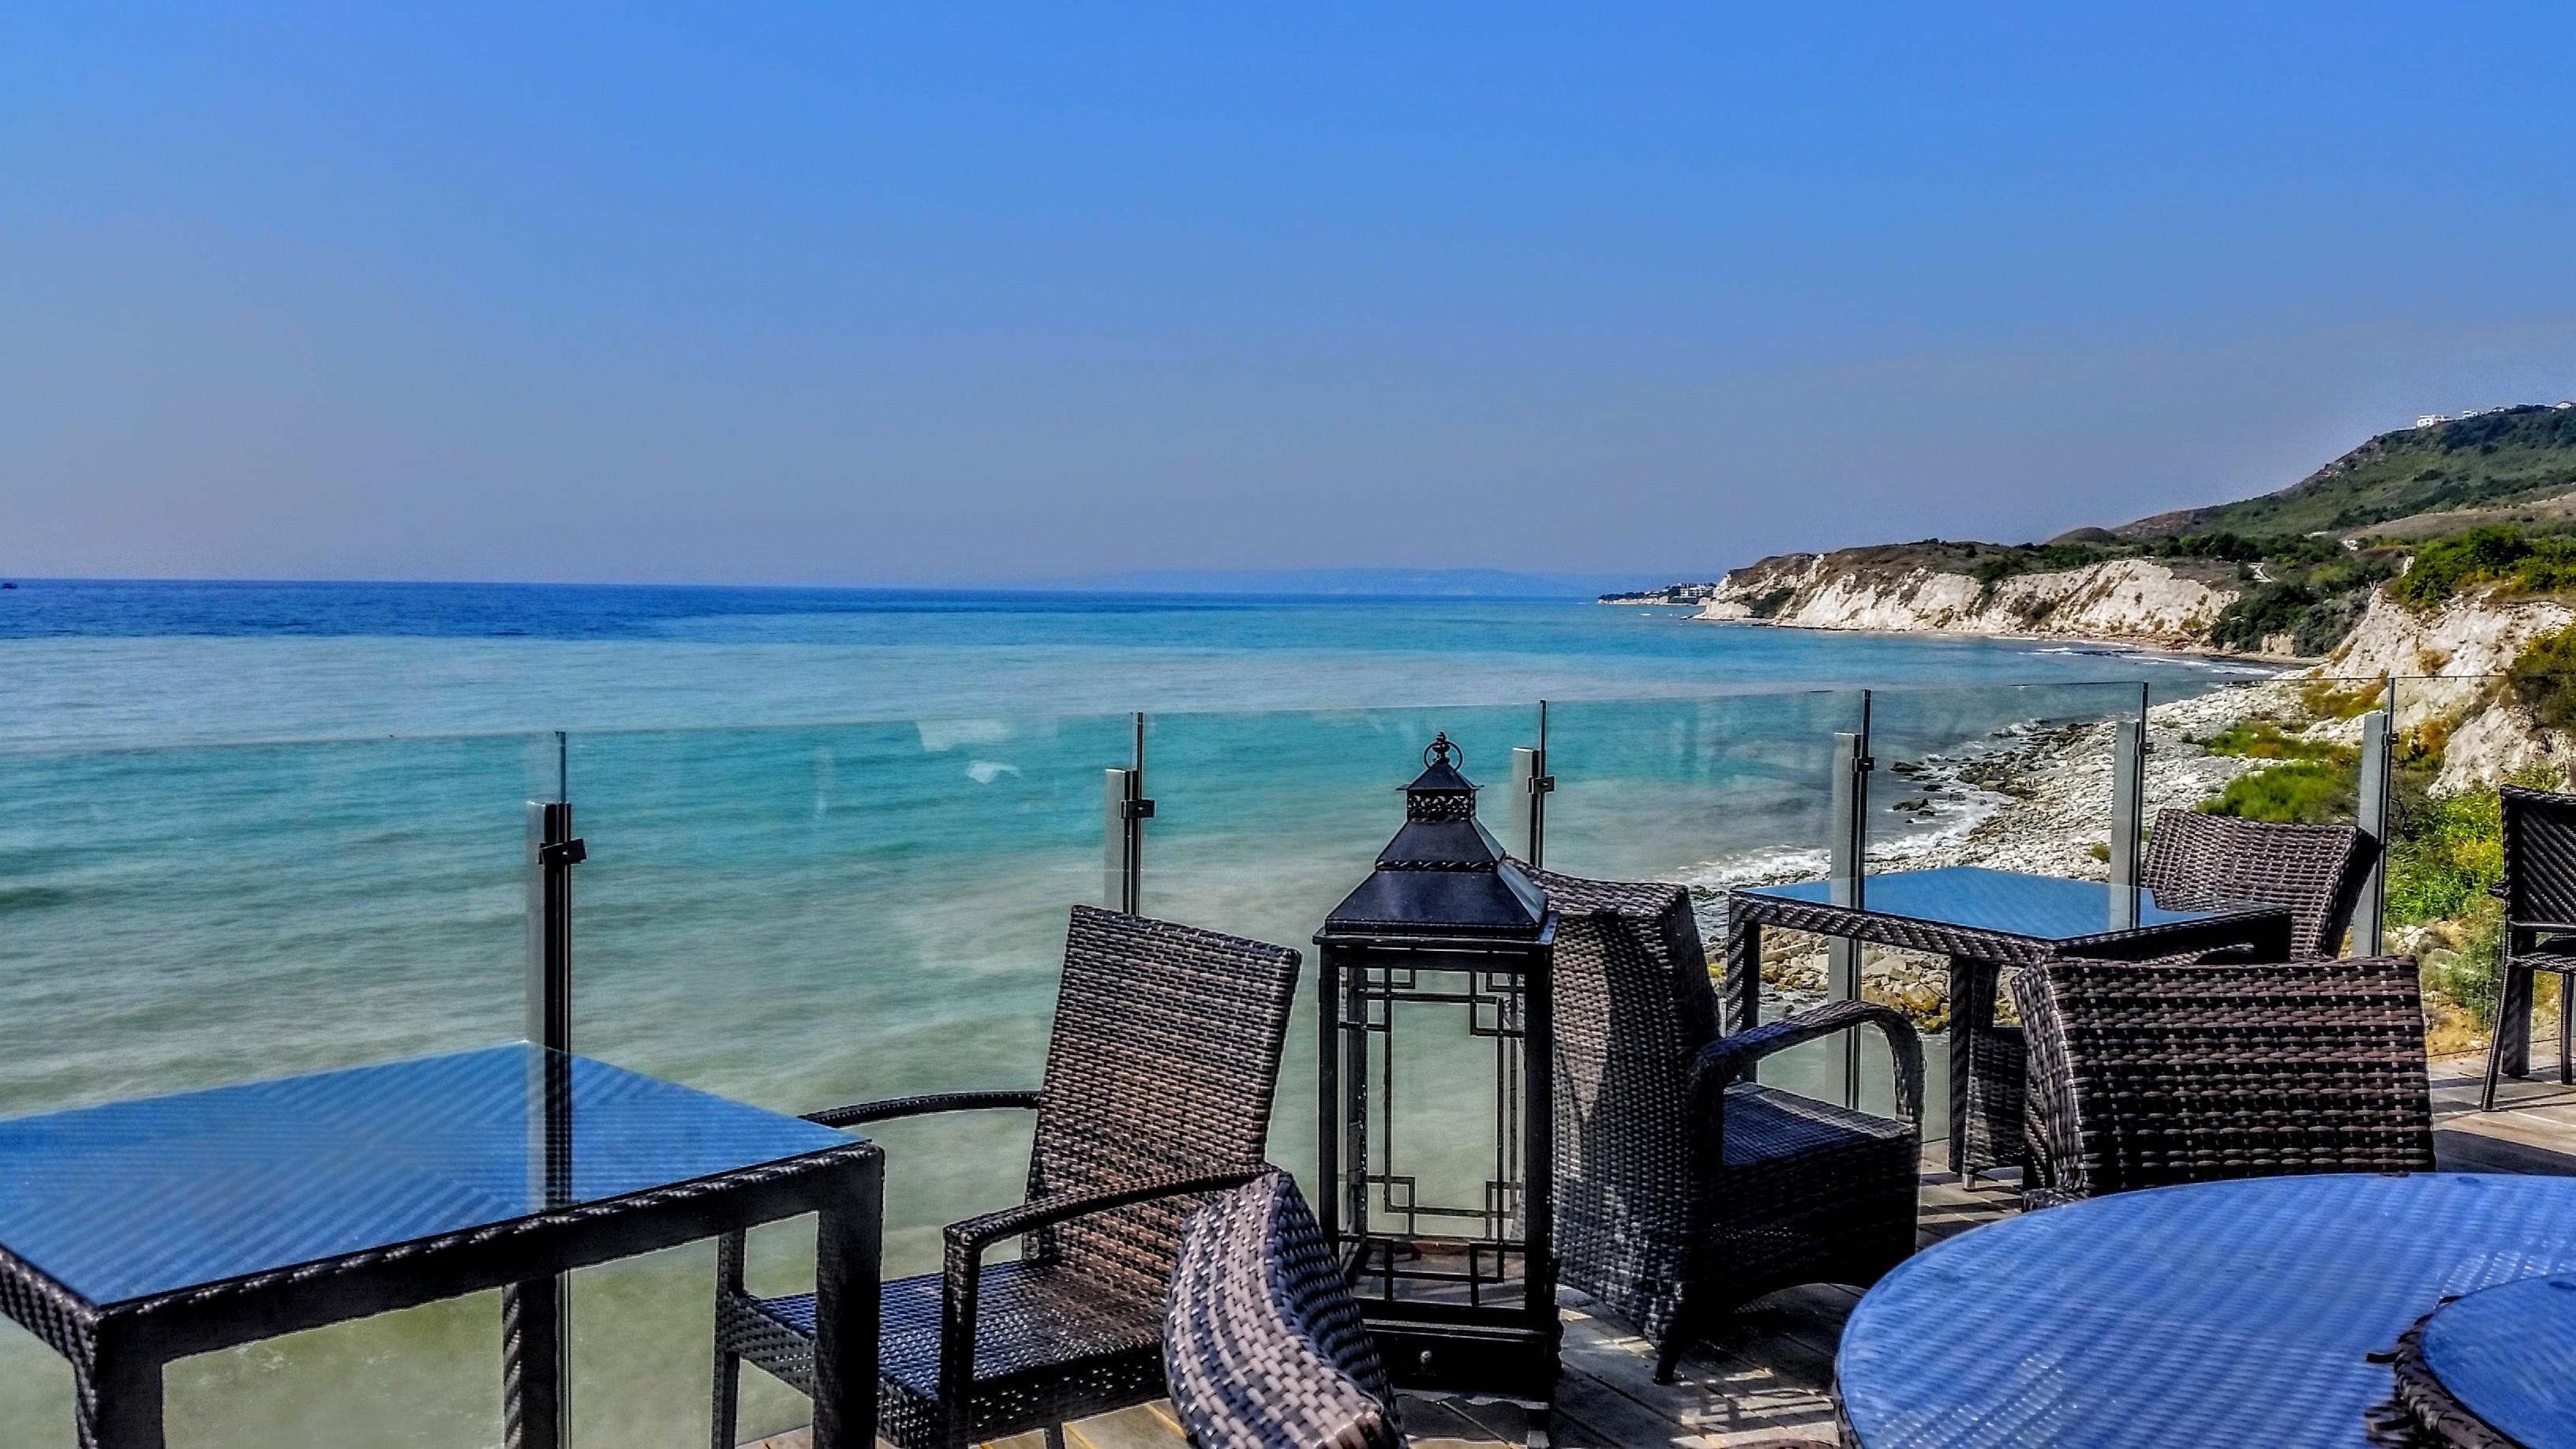 Bugarska last minute ponude Sunčev breg i Zlatni pjasci last minute